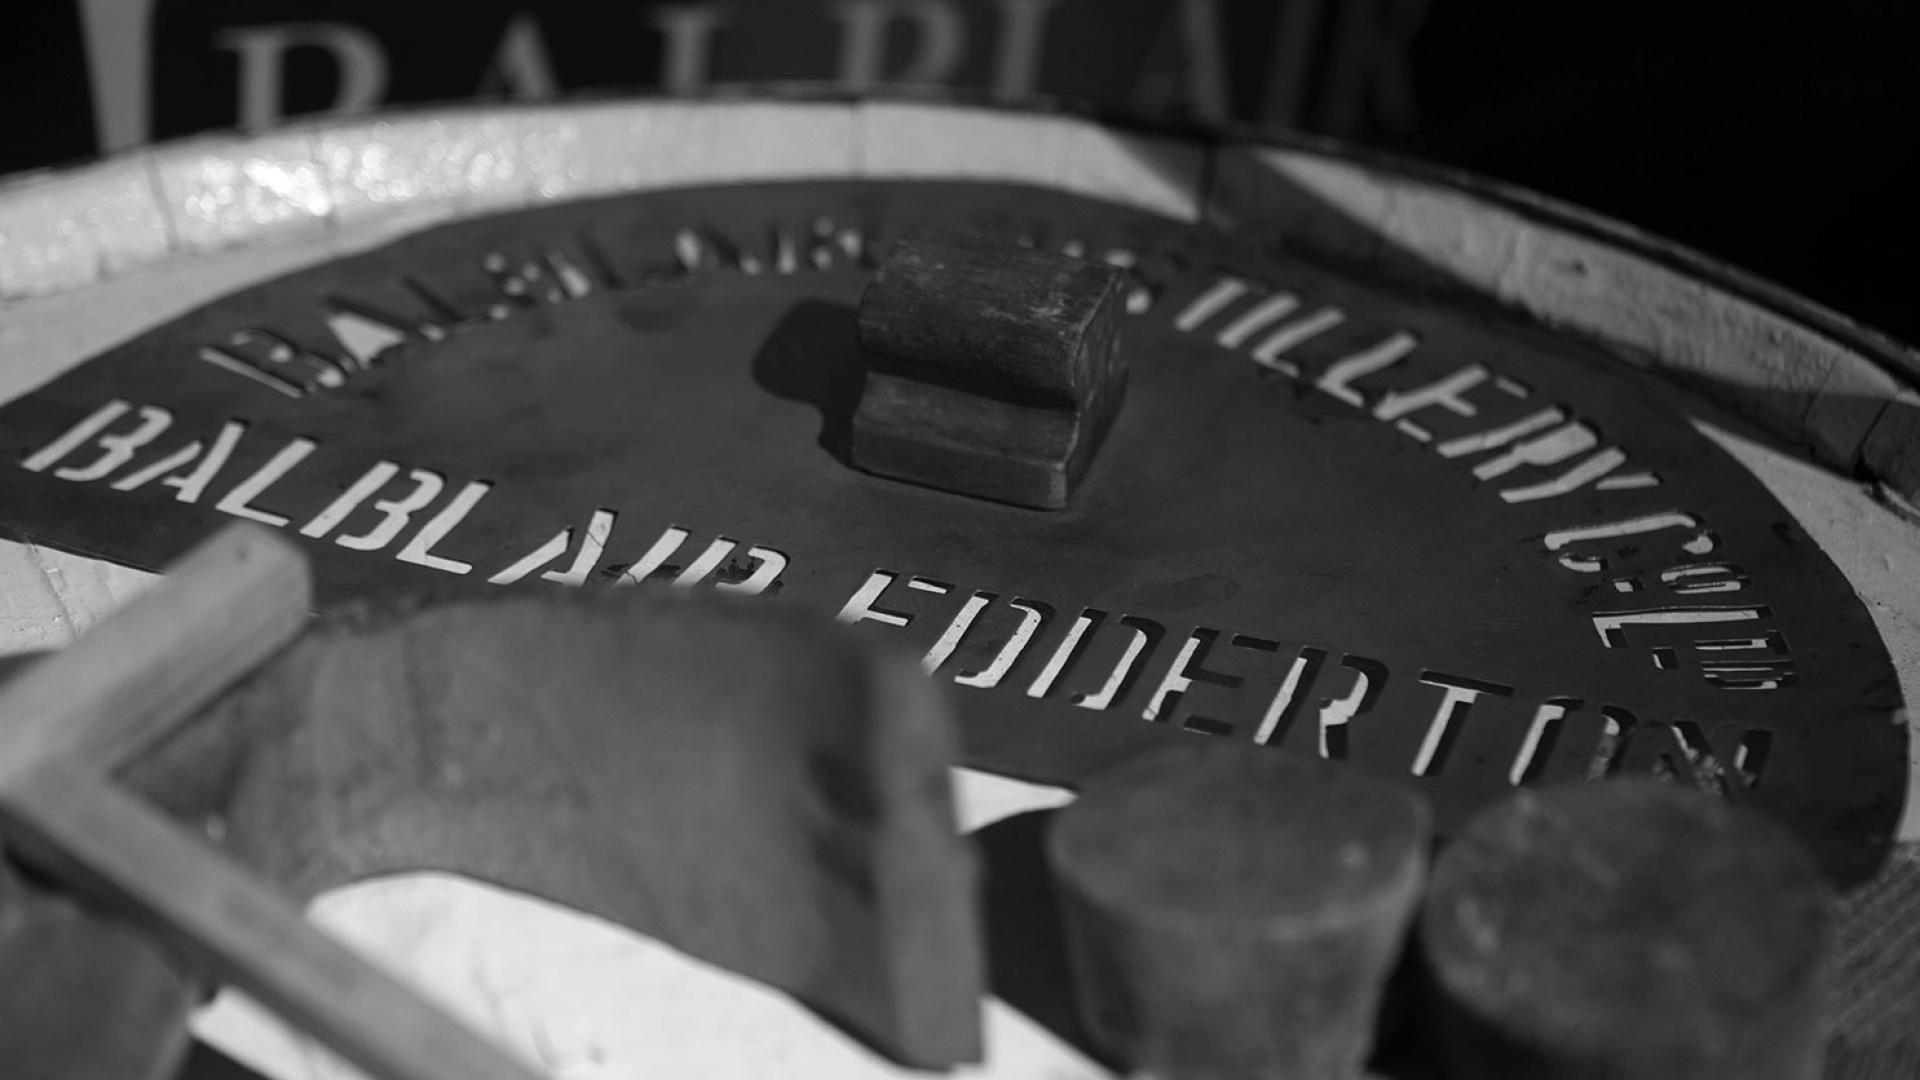 The Balblair distillery